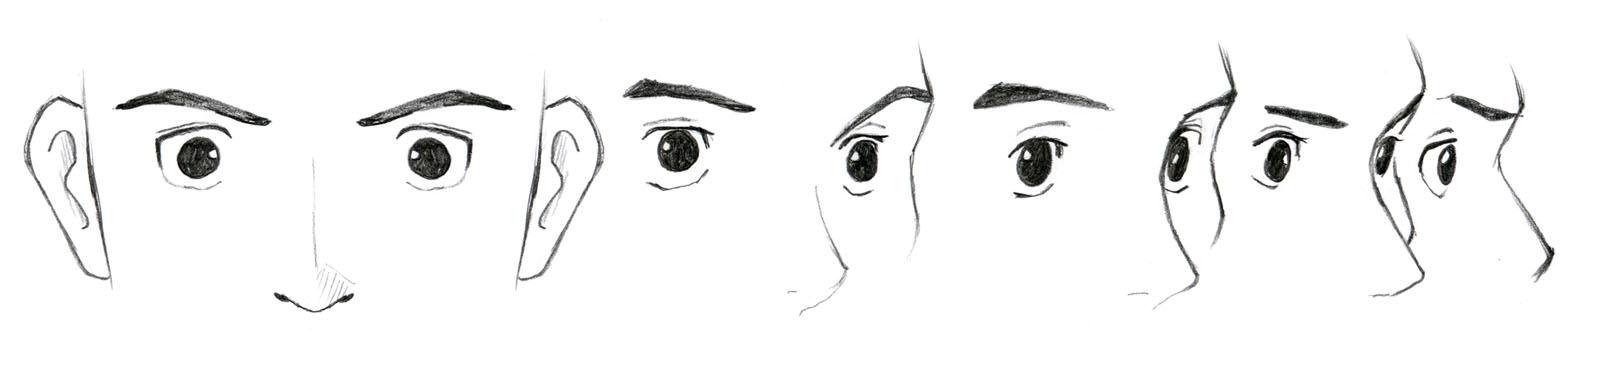 Johnnybros How To Draw Manga How To Draw Manga Eyes Part Iii